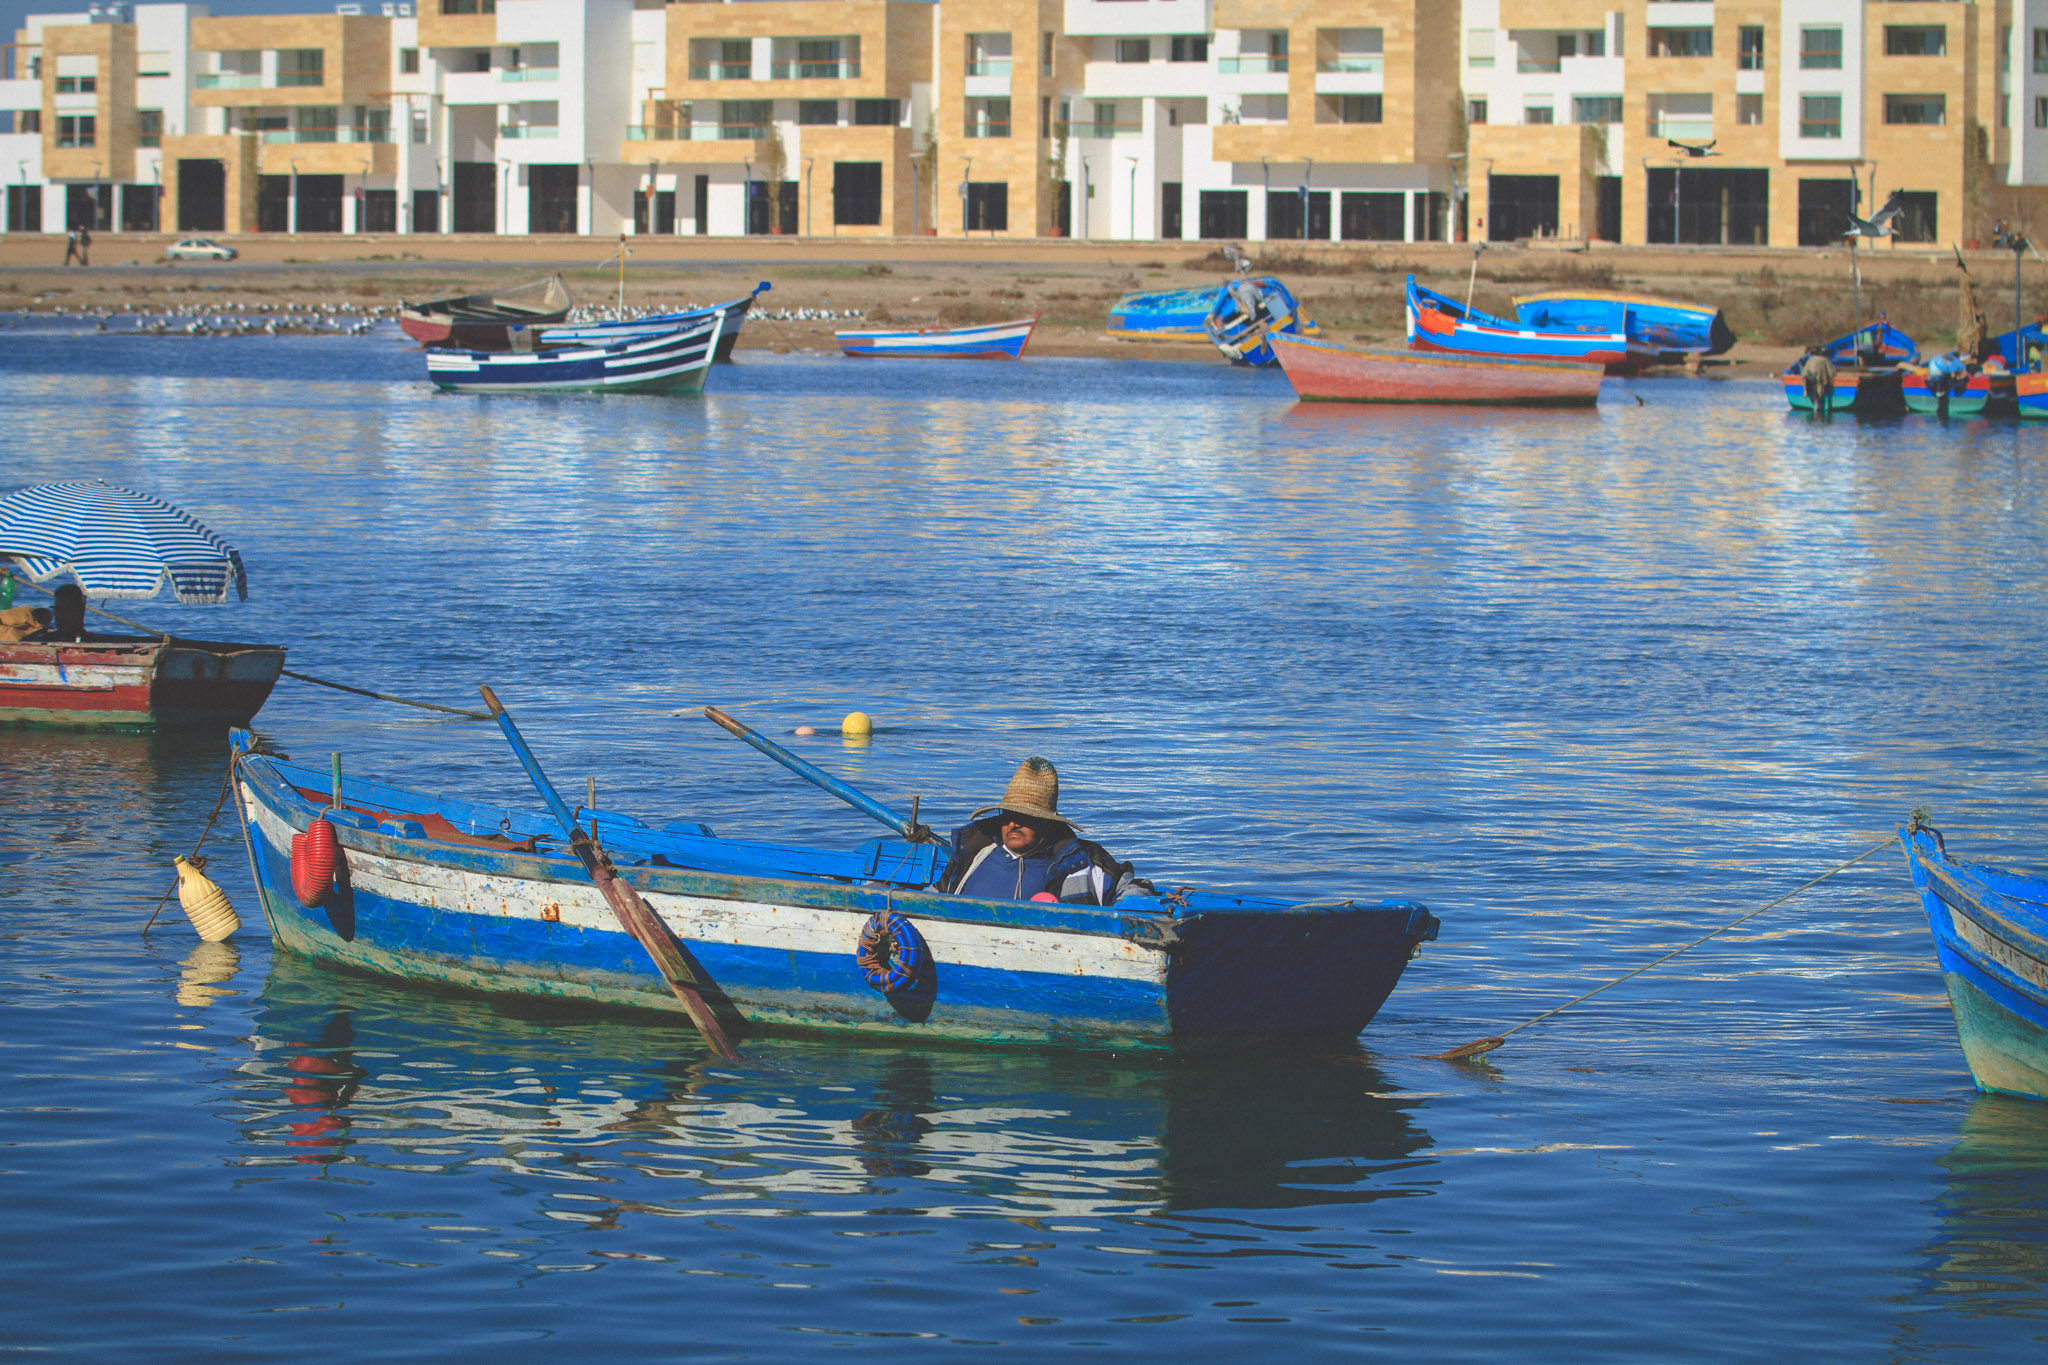 morocco_rabat_fez_casablanca_lesleyade_photography-3.jpg